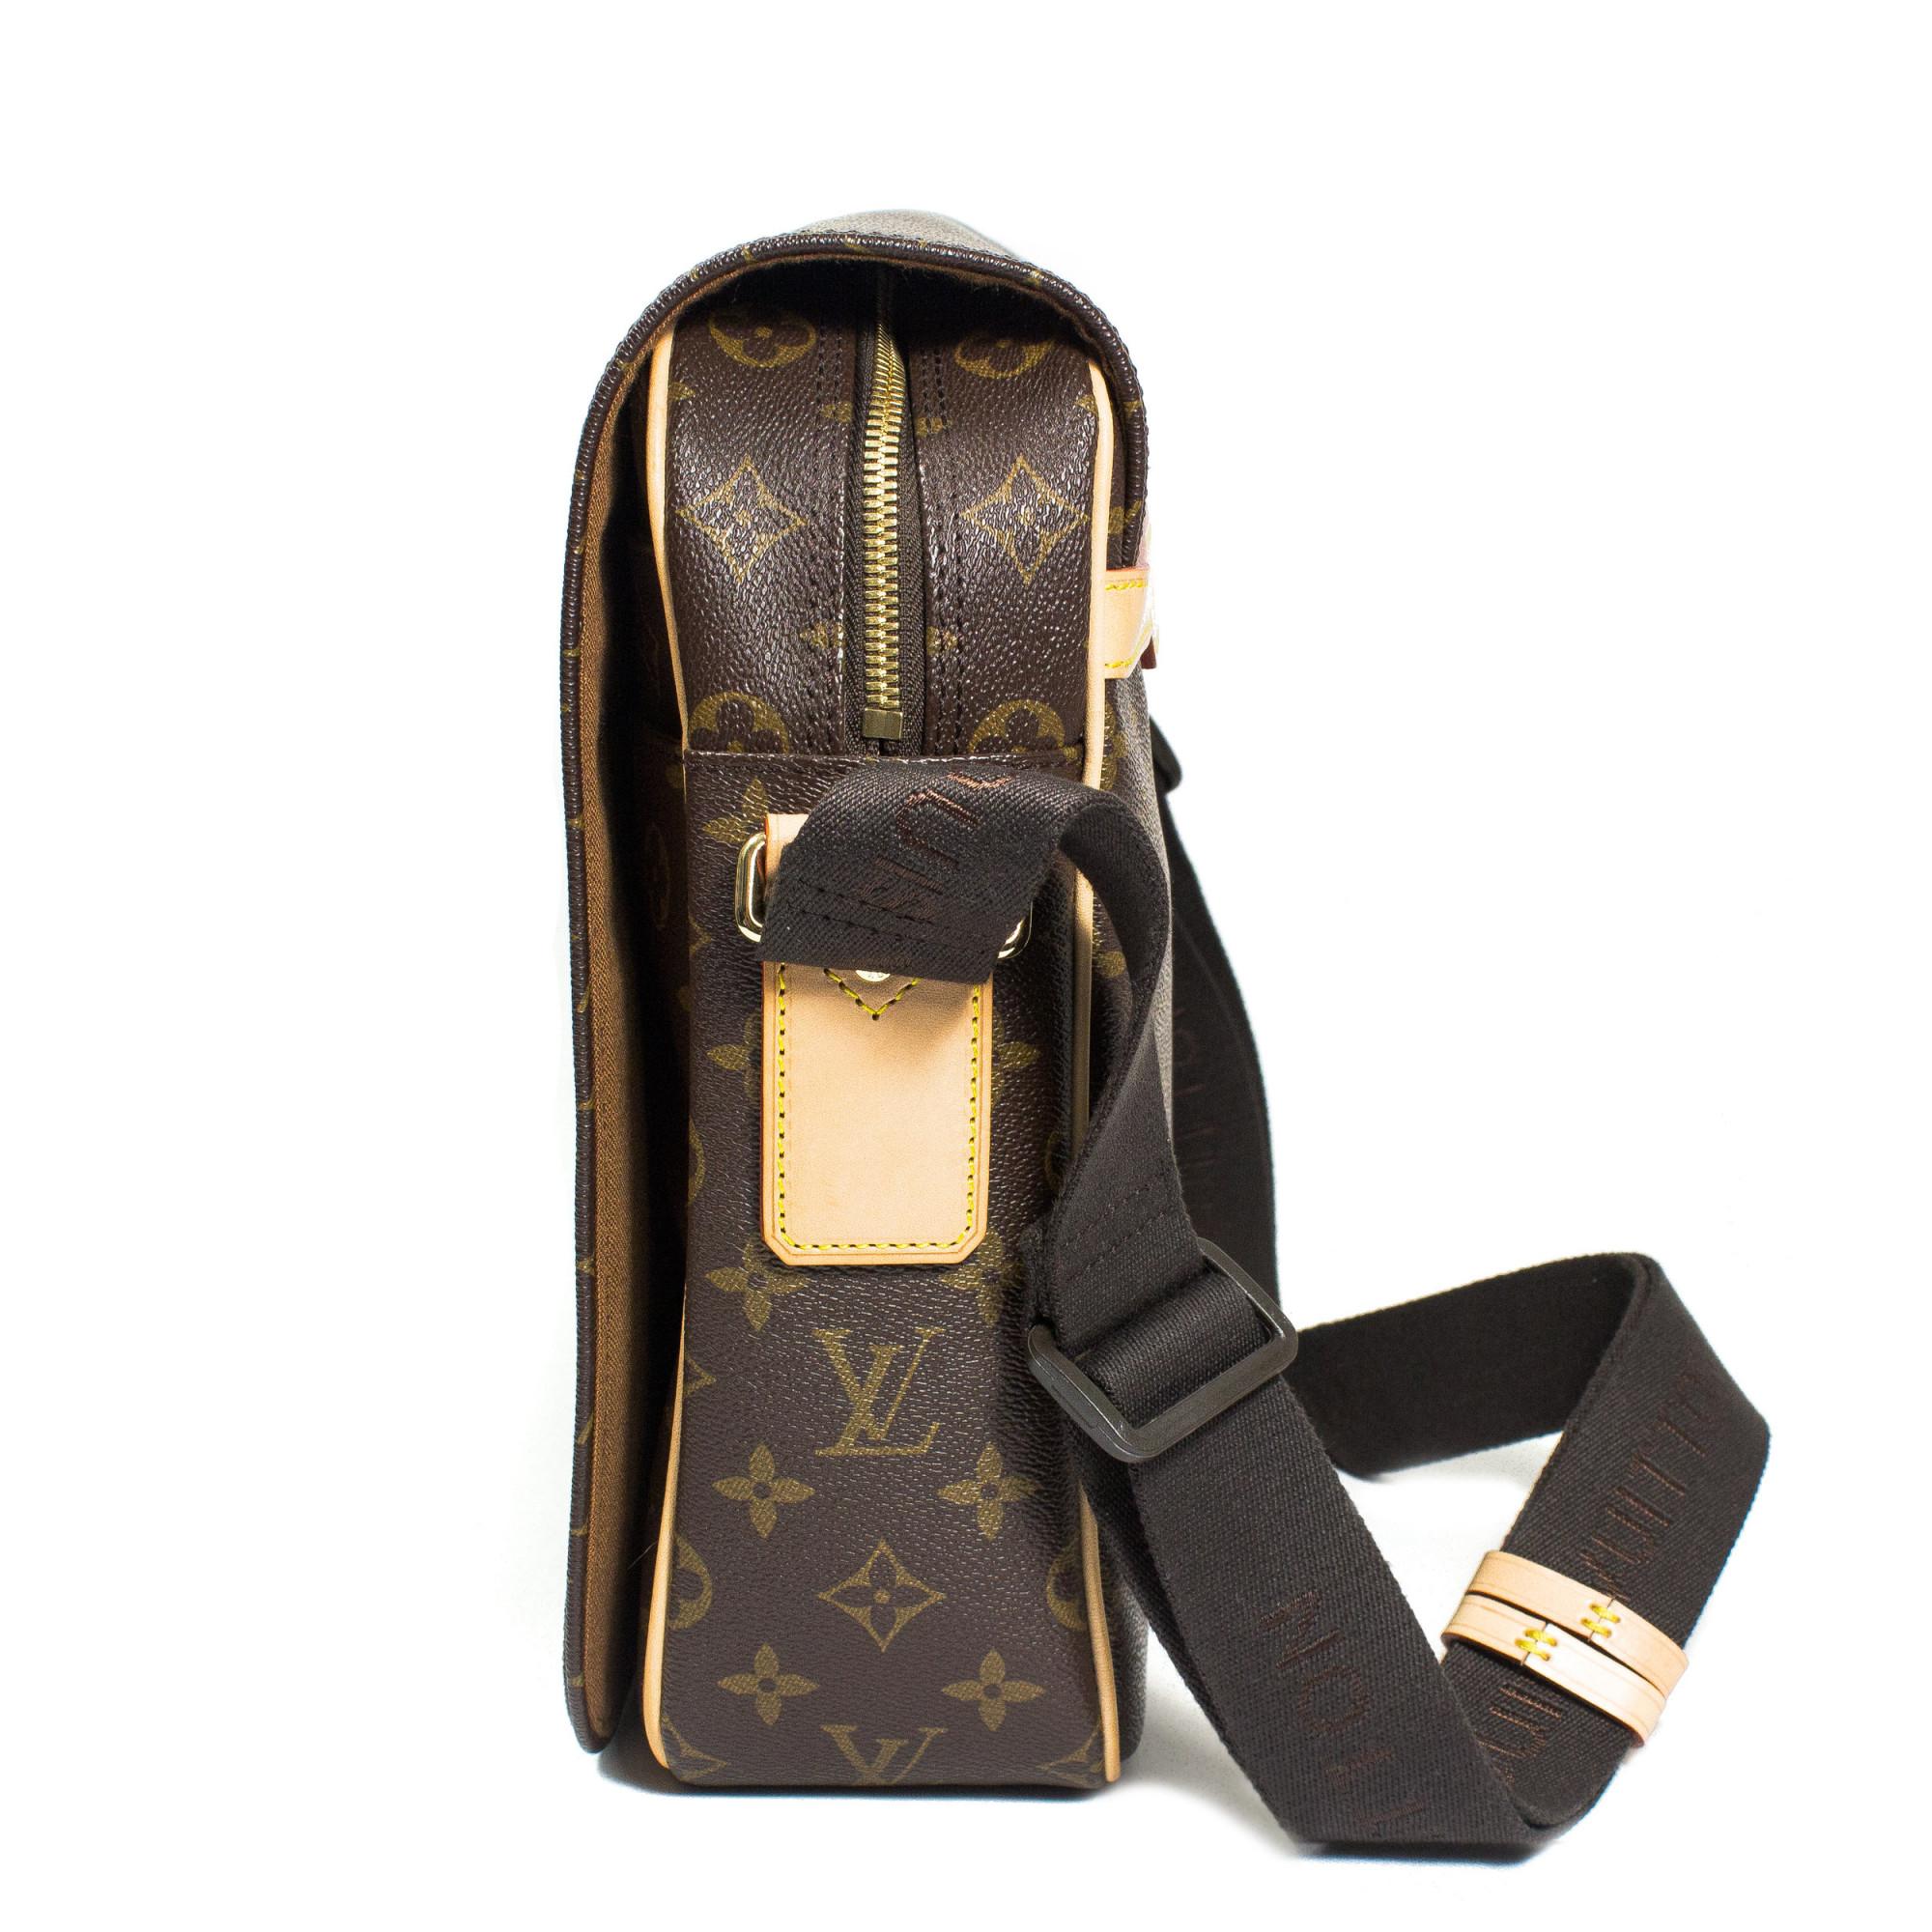 fc98ad8a3566 Купить мужская сумка Луи Вуиттон — в Киеве, код товара 10317